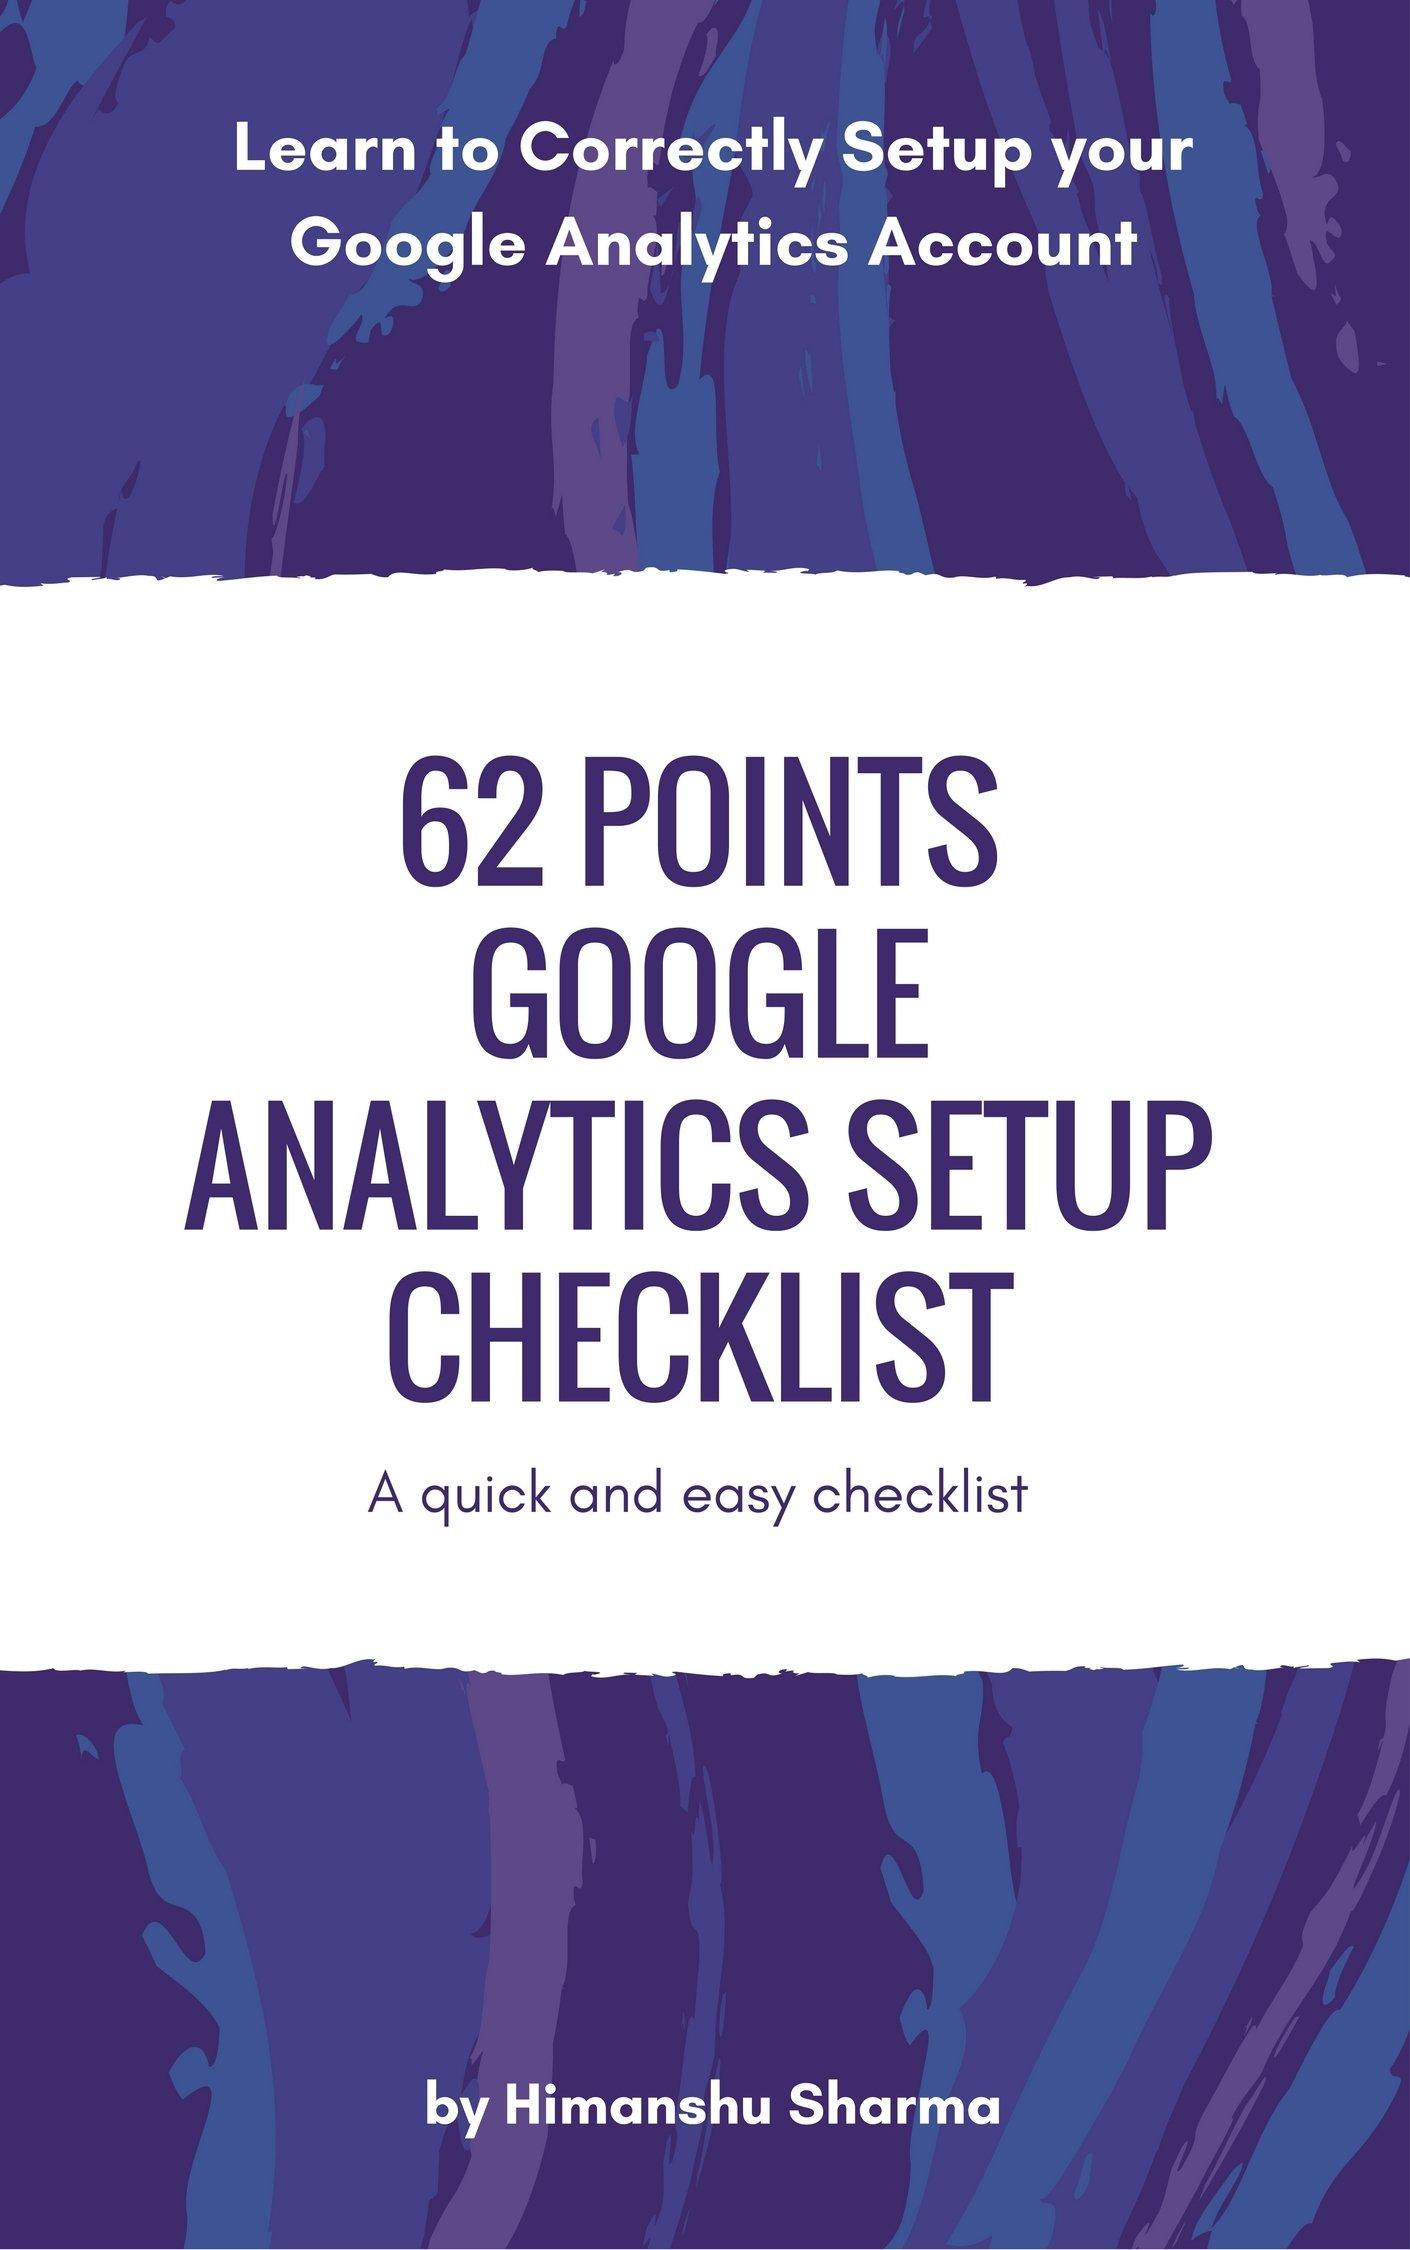 62 Points Google Analytics Setup Checklist